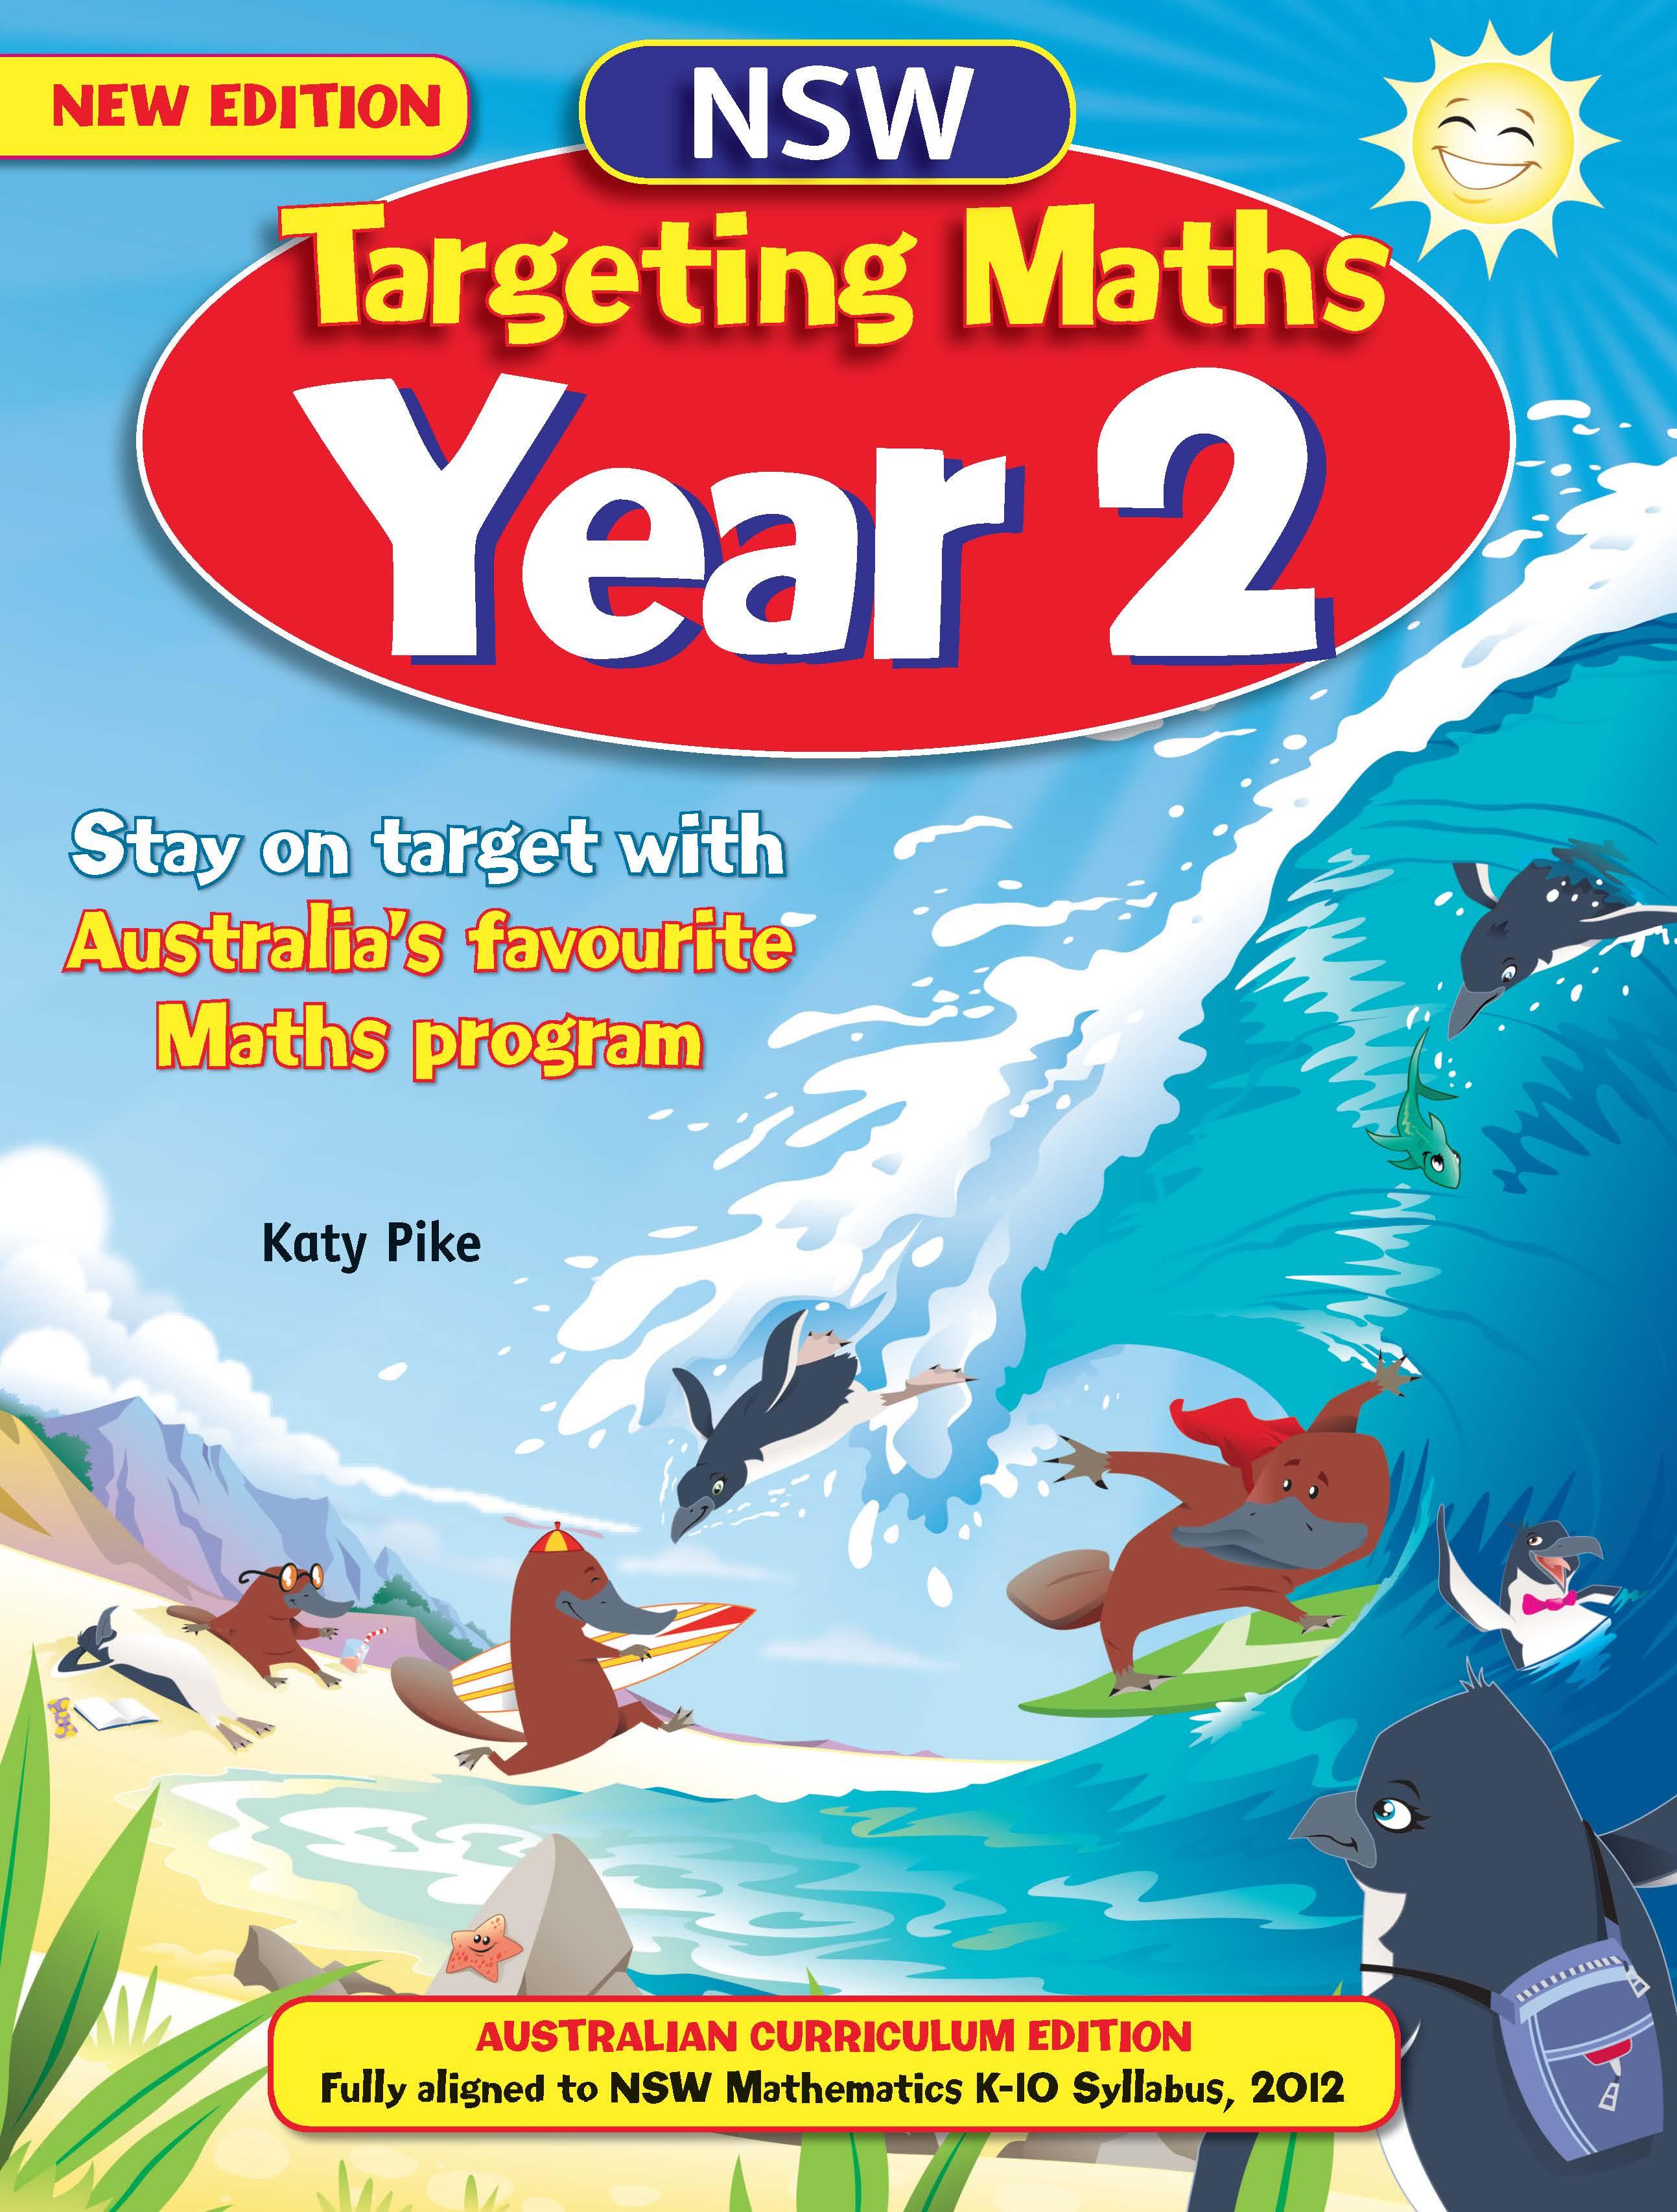 NSW Targeting Maths Australian Curriculum Edition Student Book Year 2